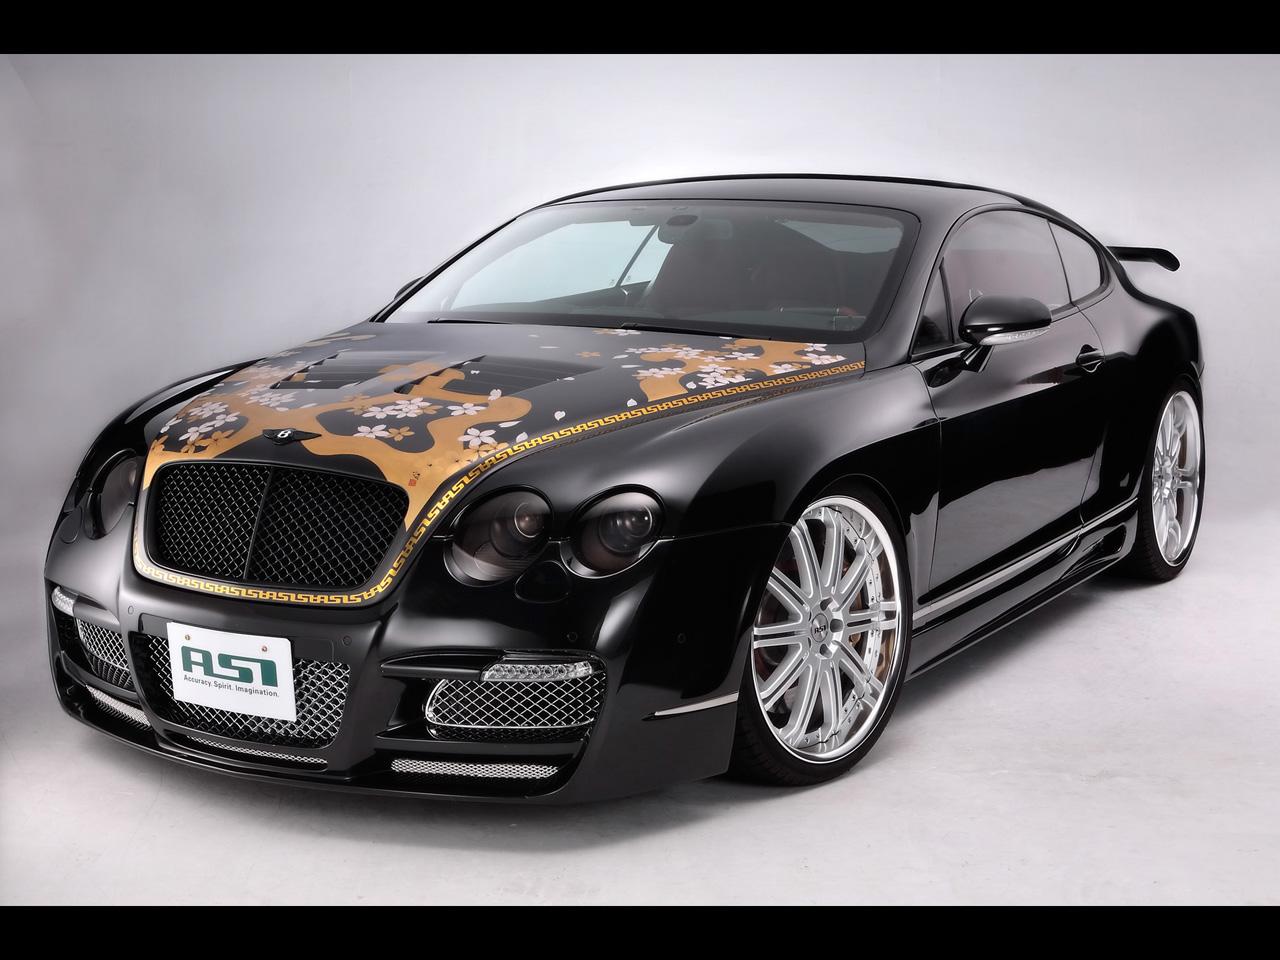 Wallpaper Backgrounds: Bentley Continental GT Wallpapers